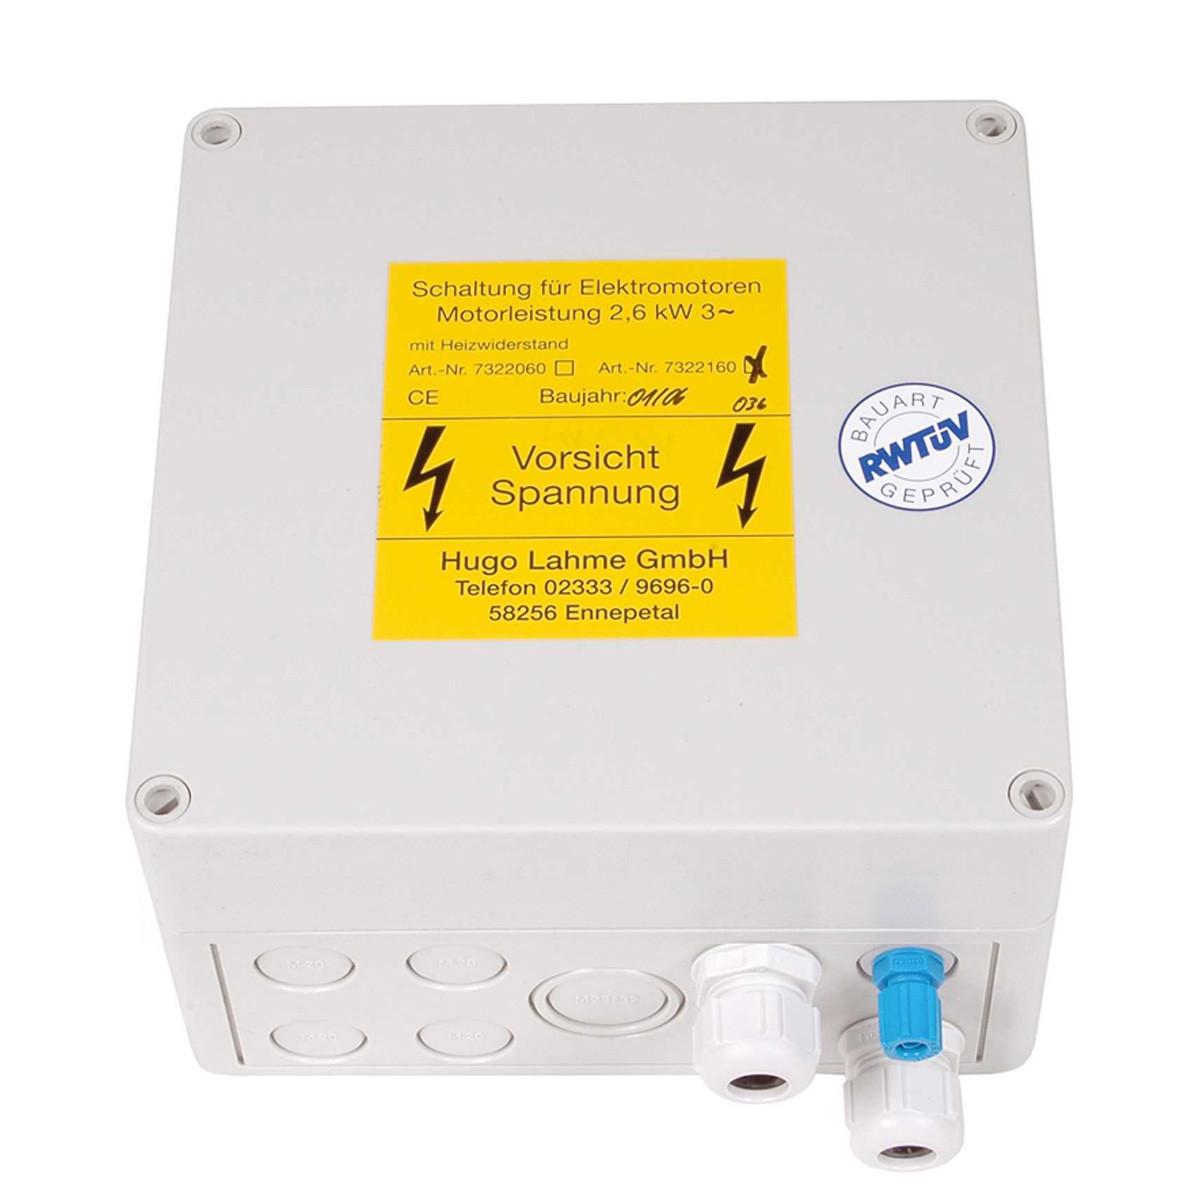 Сенсорная \ пьезо панель 2,2 кВт, DS Fitstar